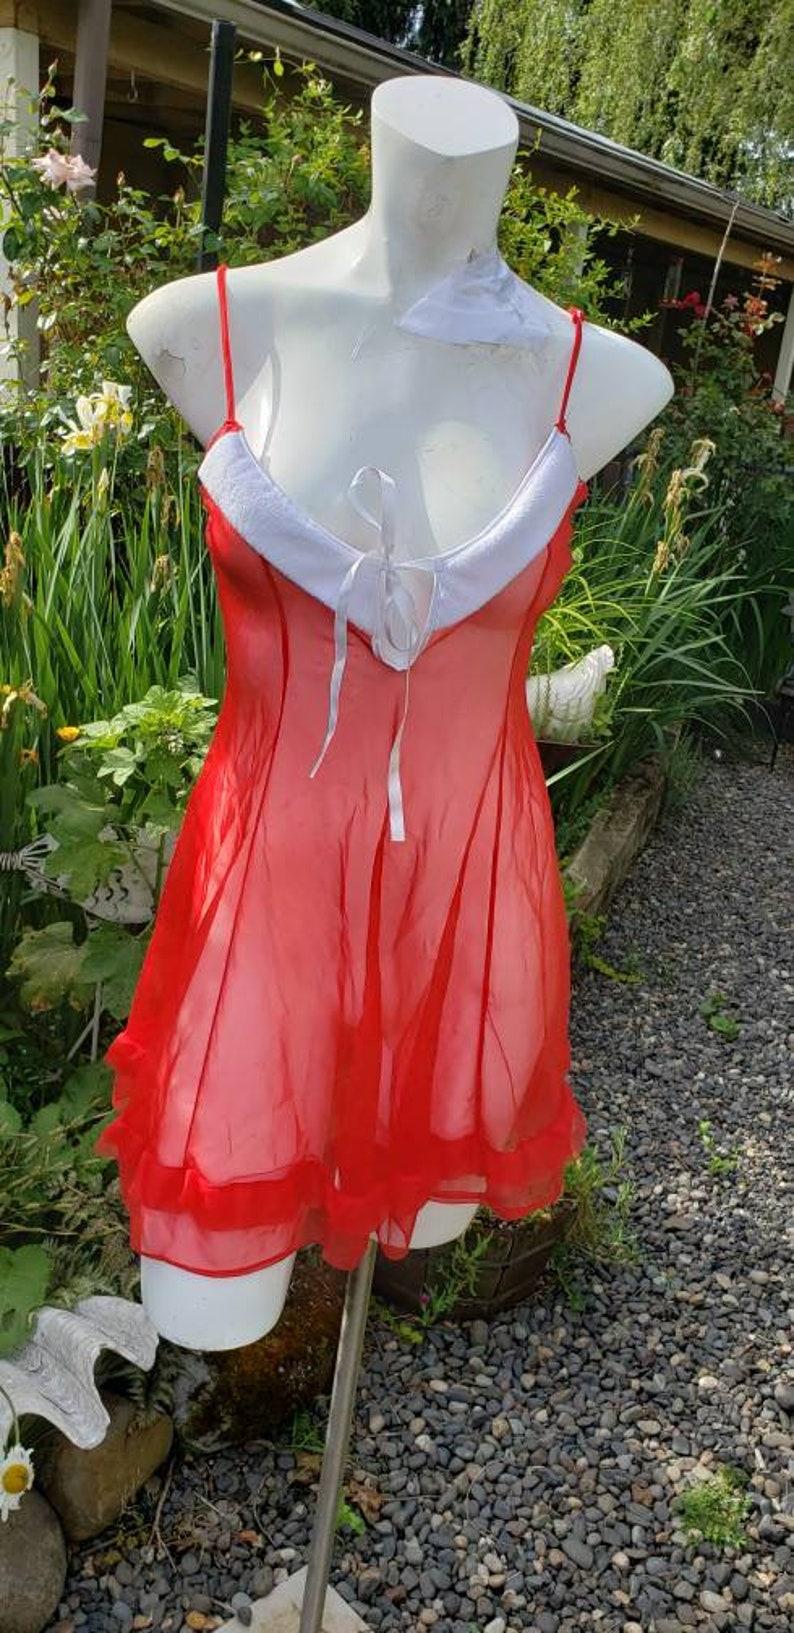 Red vintage  Lingerie Size 2X Holiday Gift Undergarment  Ladies loungewear  Intimate  Feminine Luxury item Date Honeymoon READY